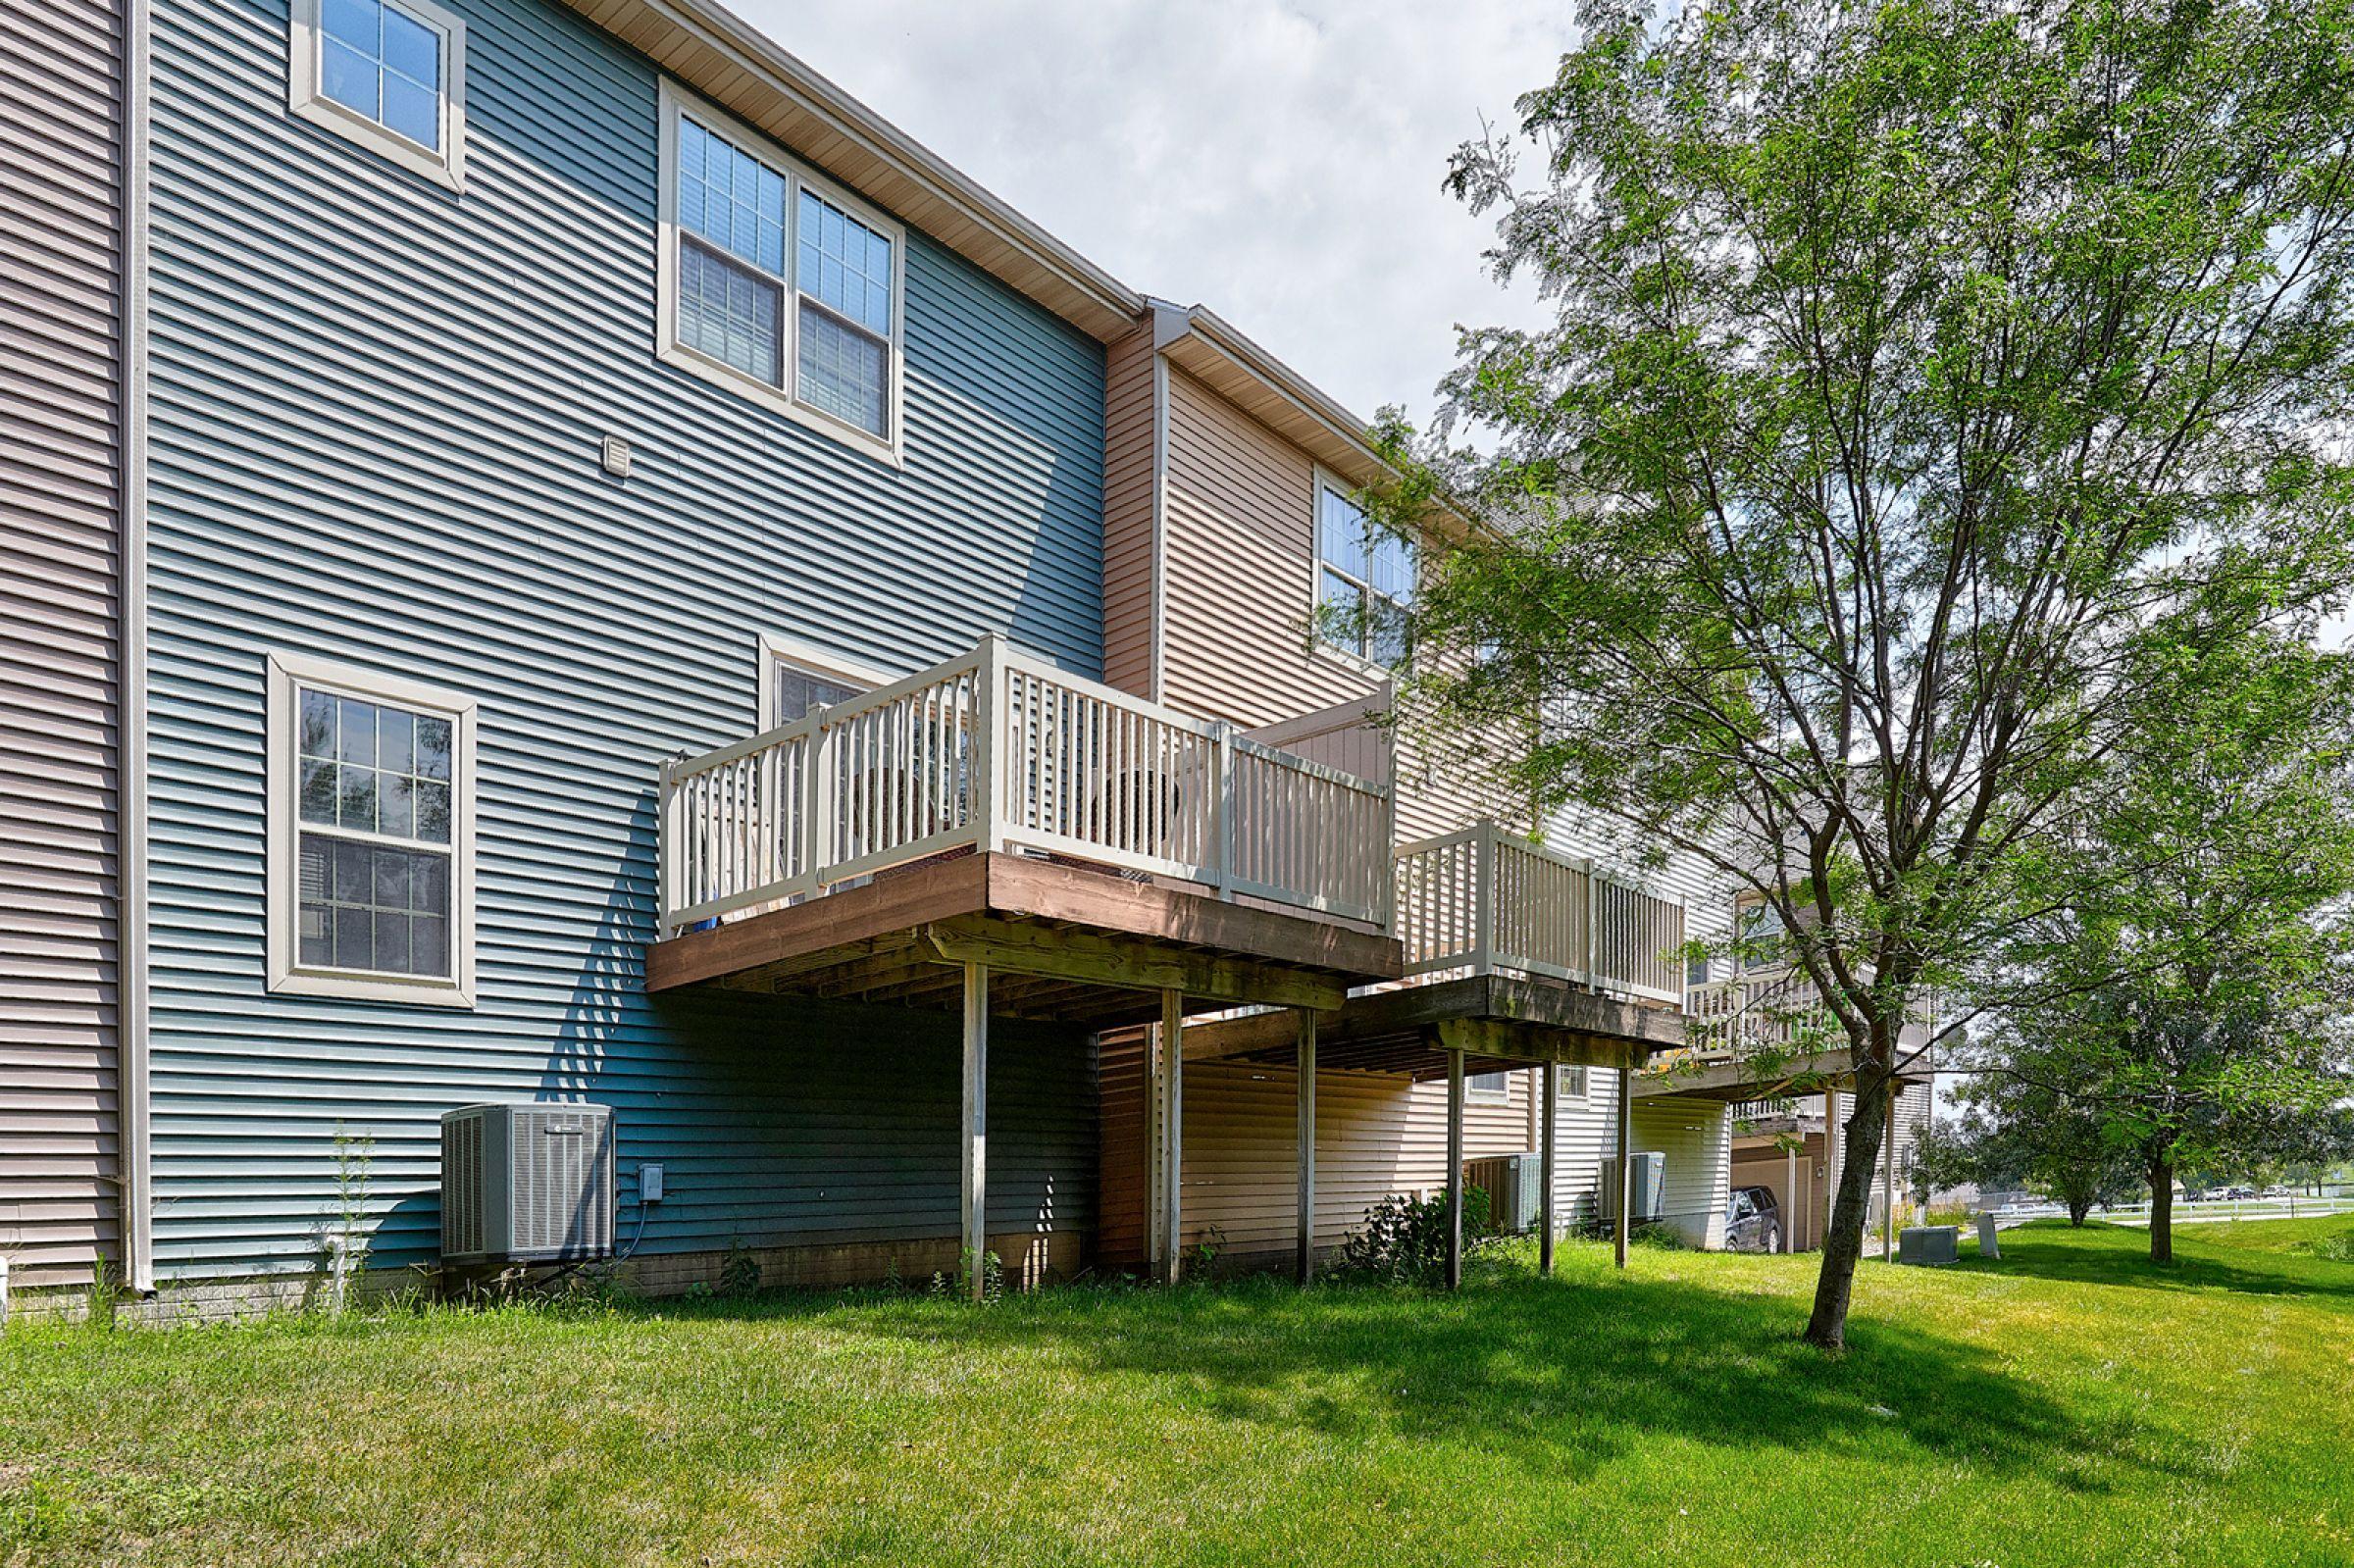 residential-polk-county-iowa-0-acres-listing-number-15662-0-2021-08-03-023733.jpg